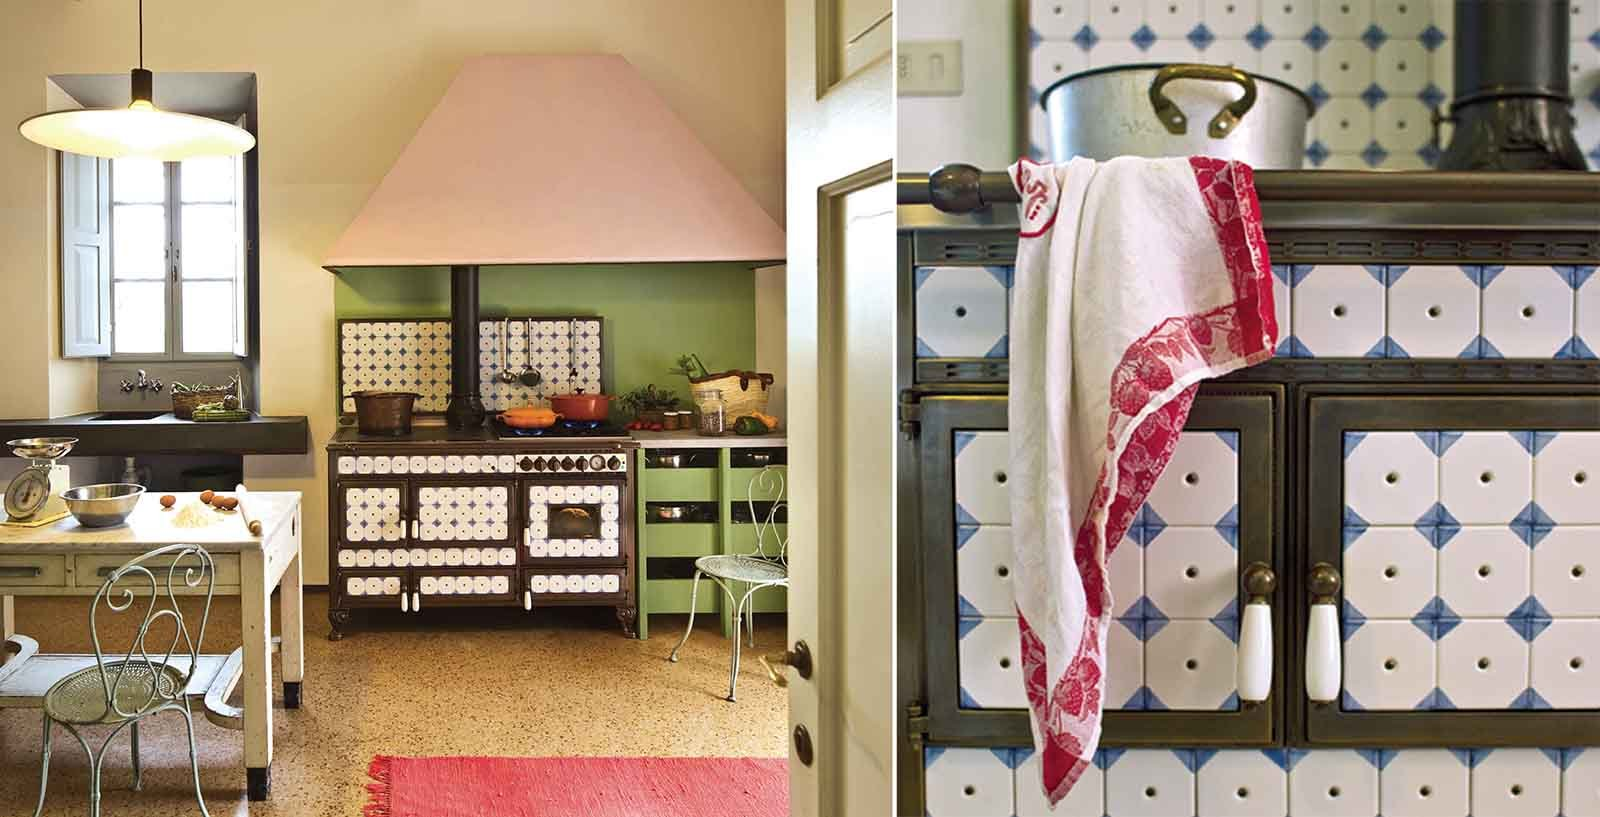 Cucine decorate per un ambiente originale e vivace cose for Piastrelle maiolica cucina